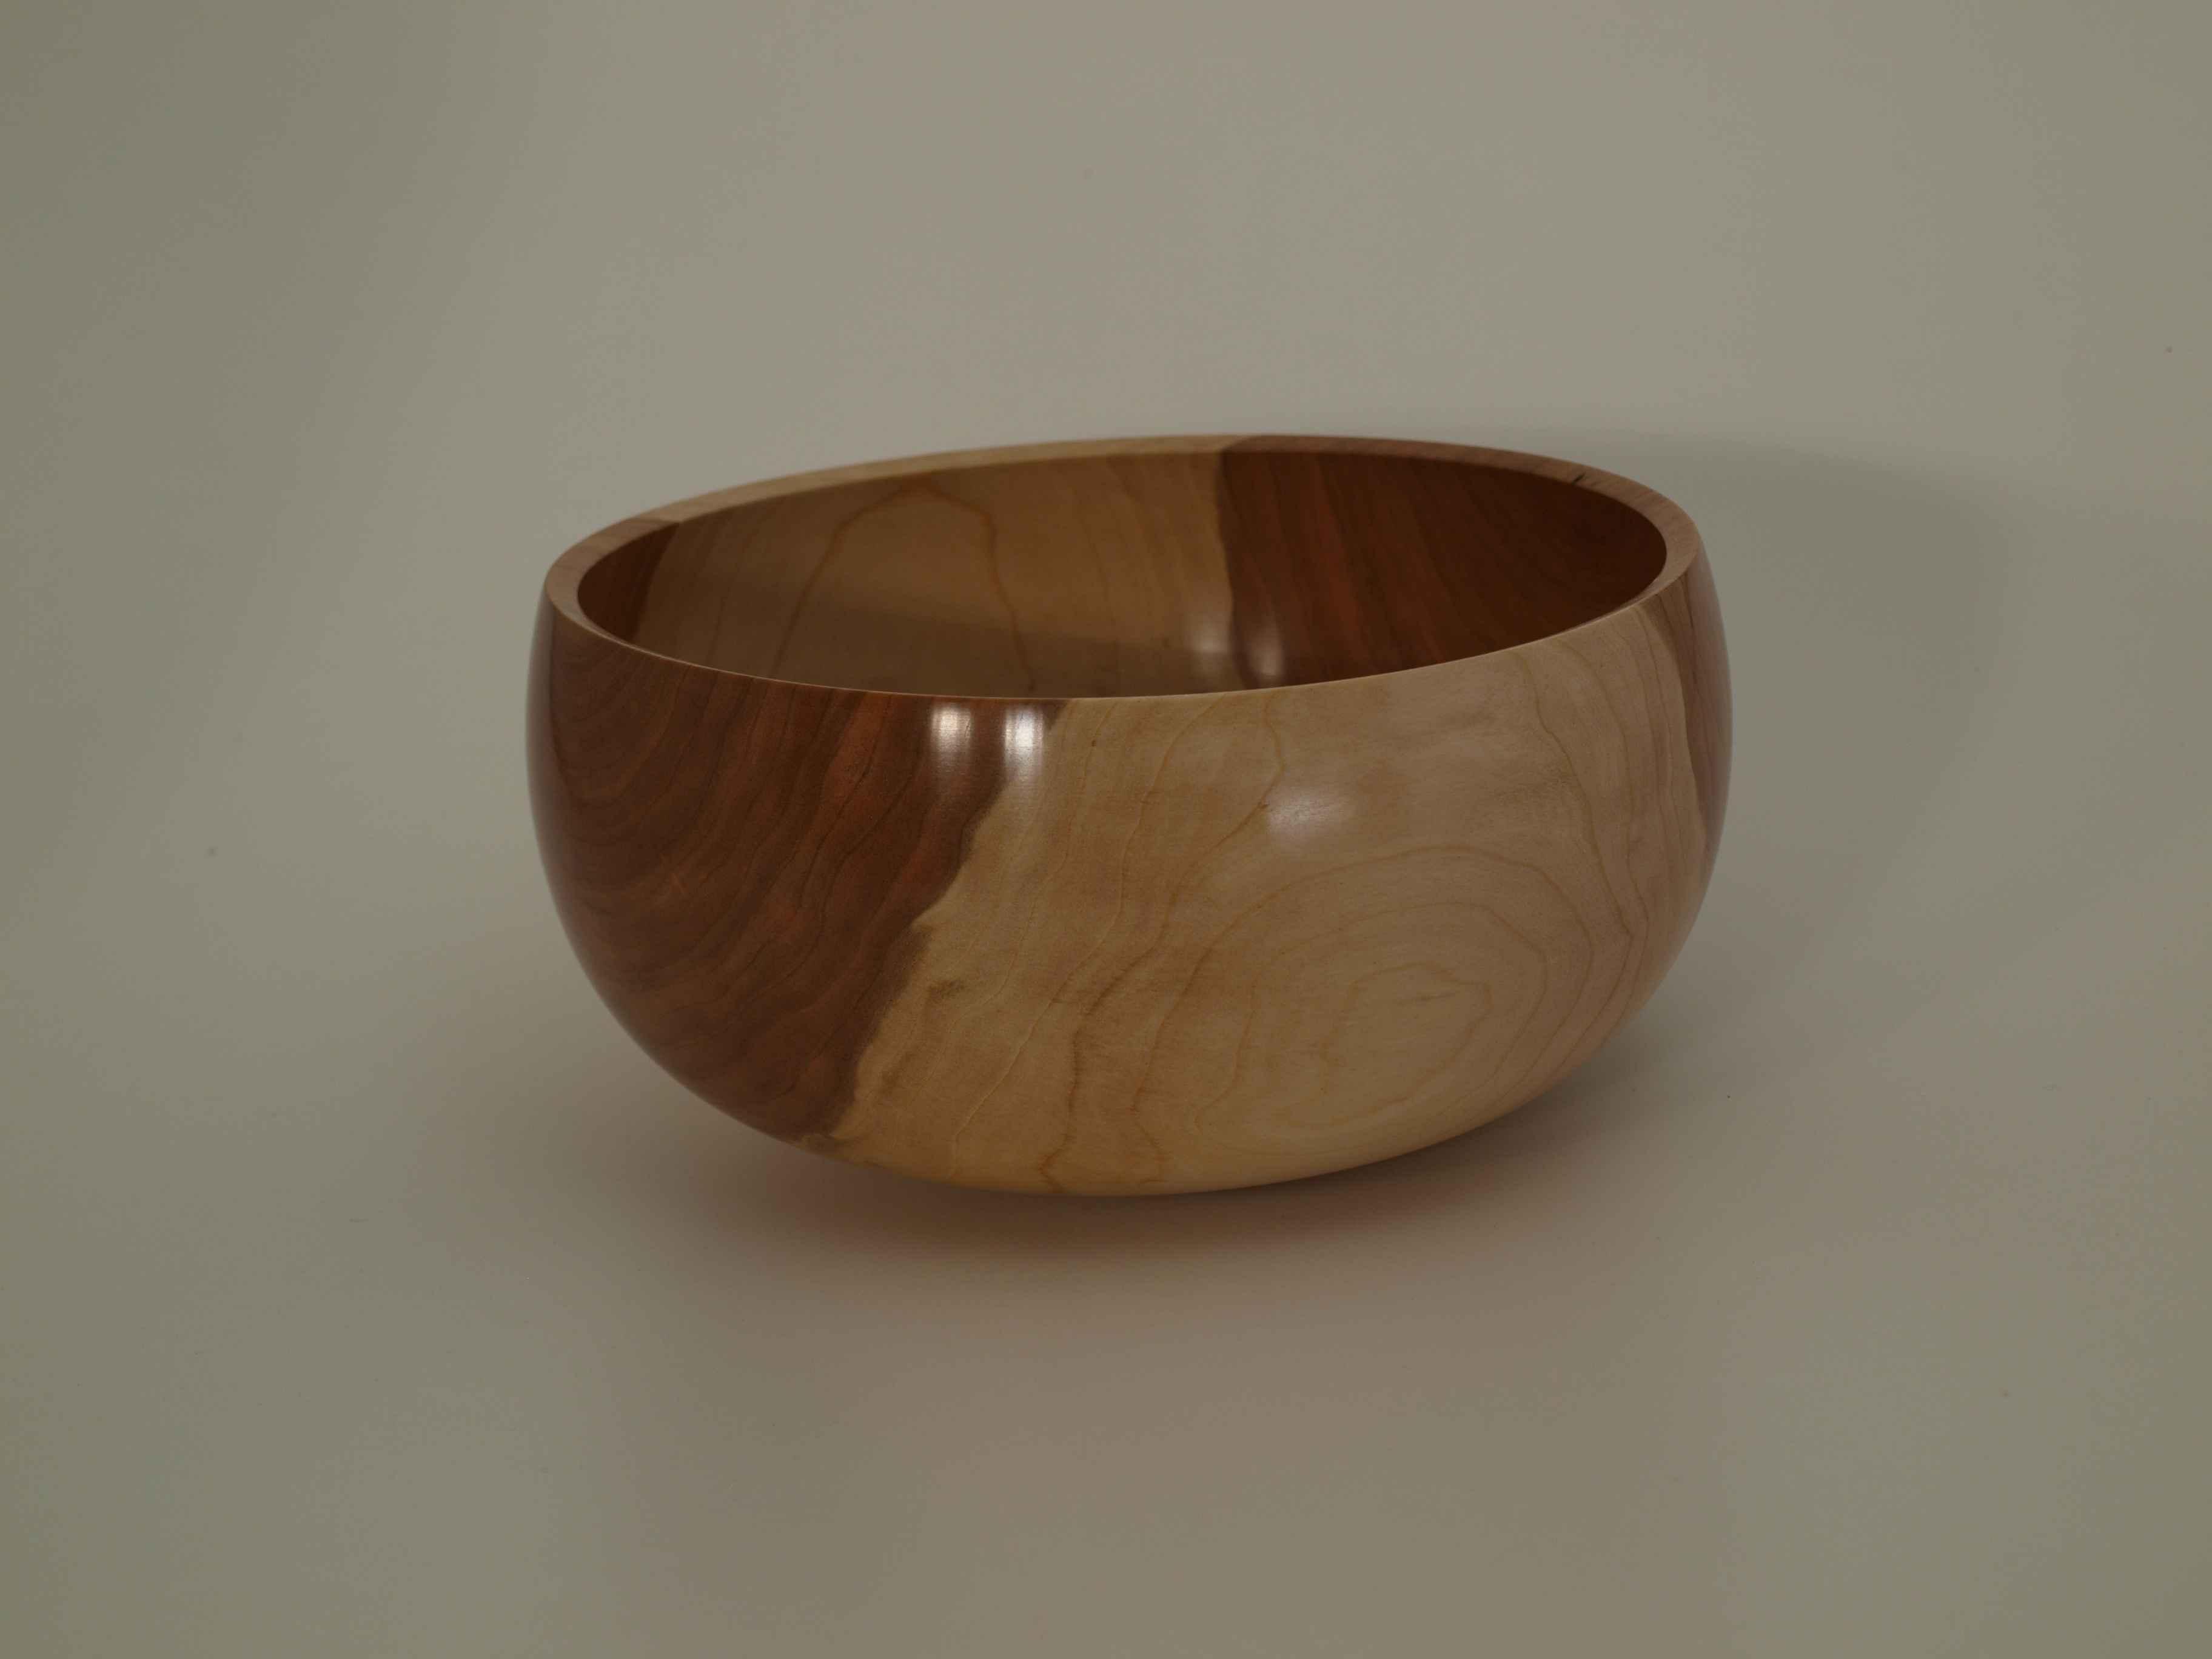 Small Cherry Bowl #3